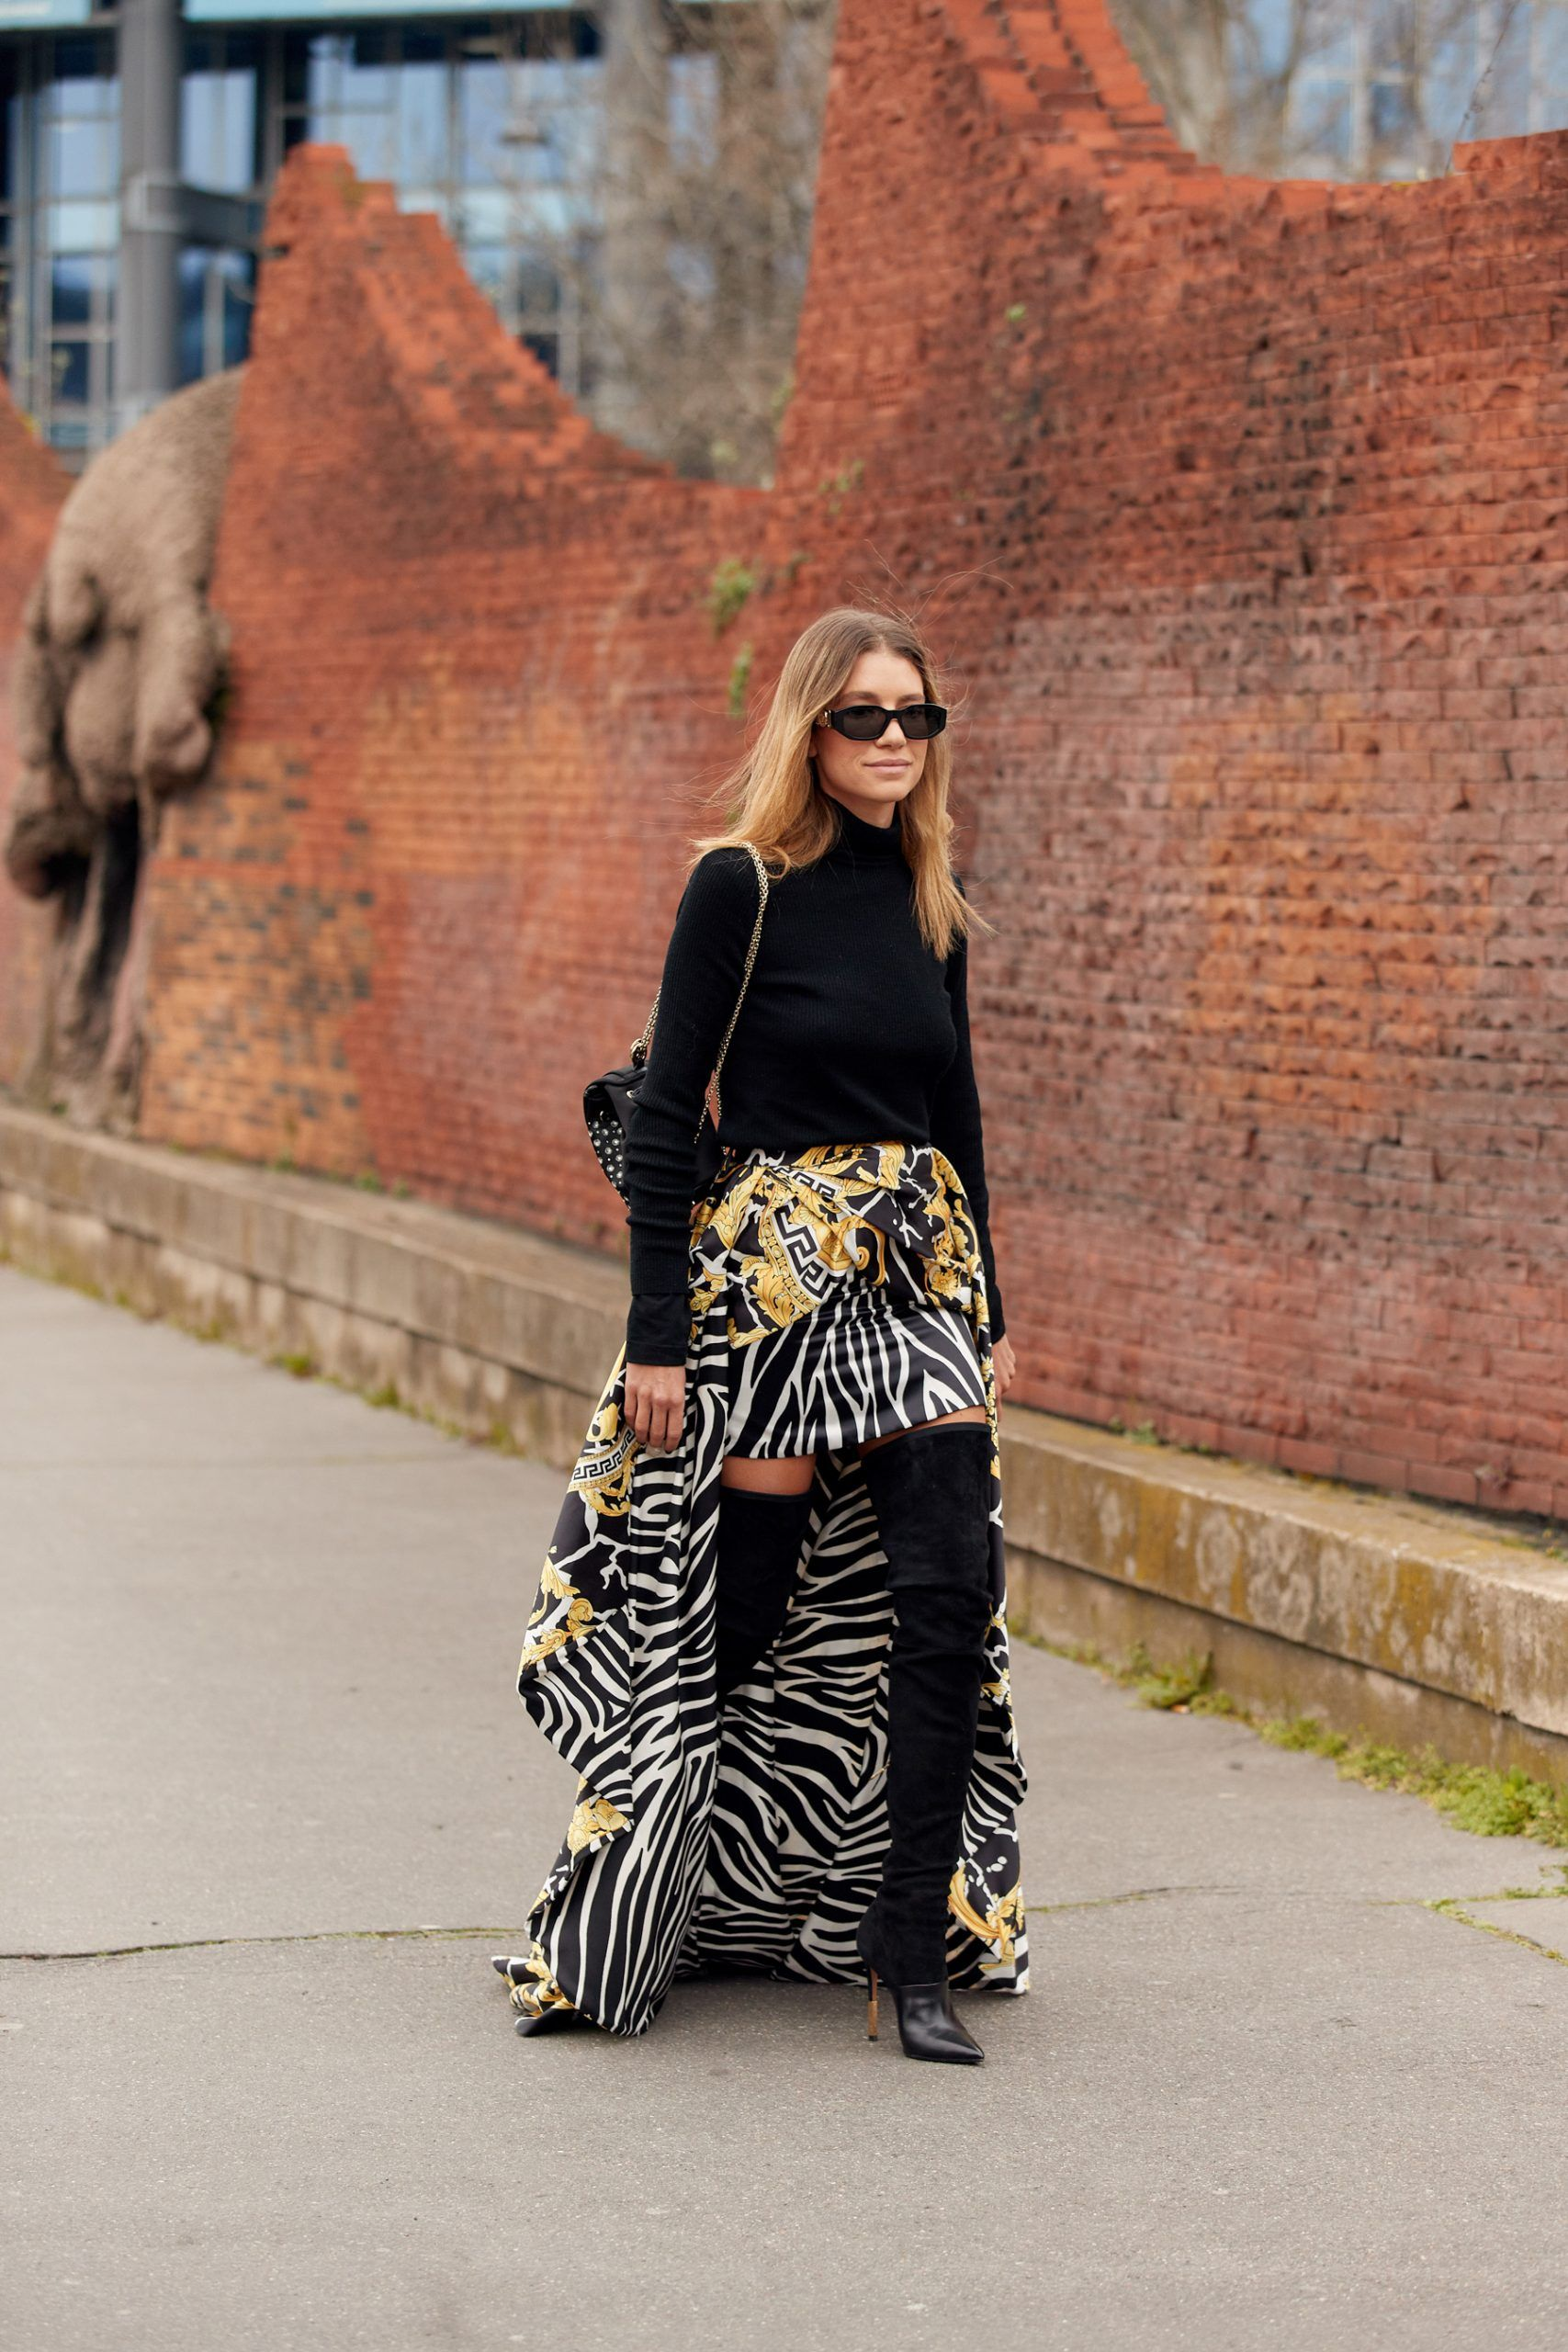 Paris Street Style Fall 2020 4 TER in 2020 | Autumn street style, Street  style, Cool street fashion